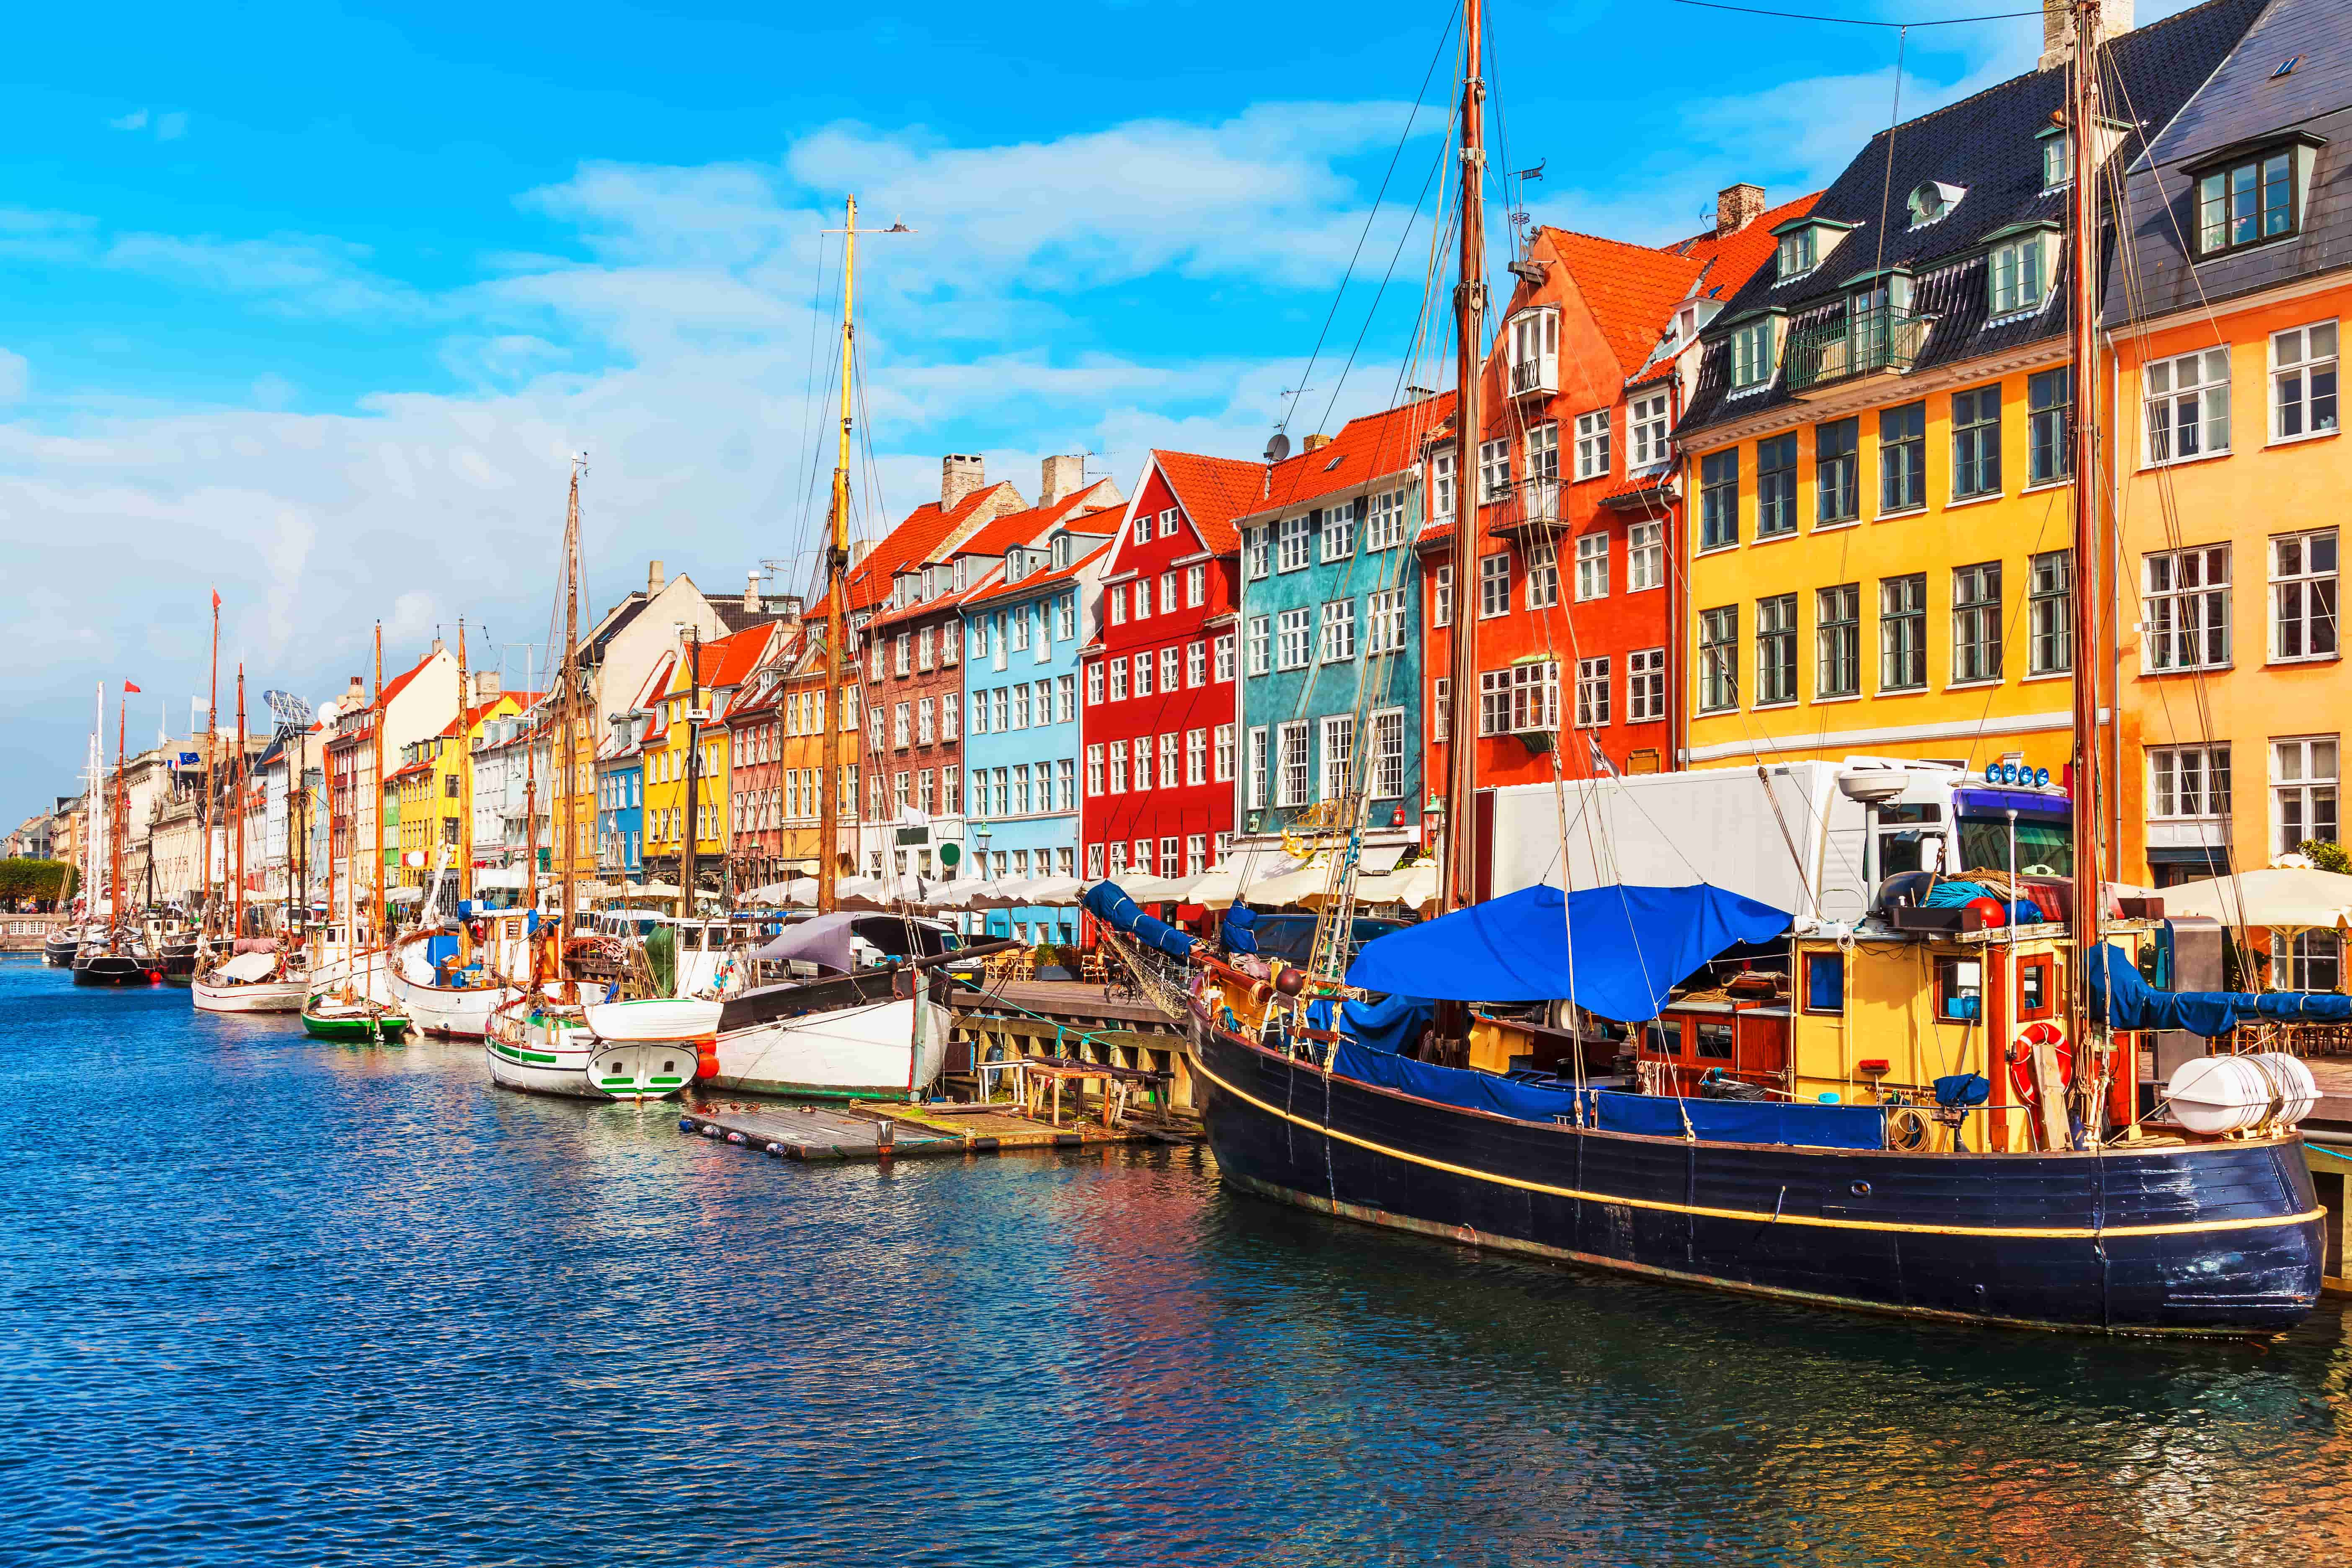 Copenhague_Danemark_Nyhavn, Copenhagen, Denmark_80551292-min